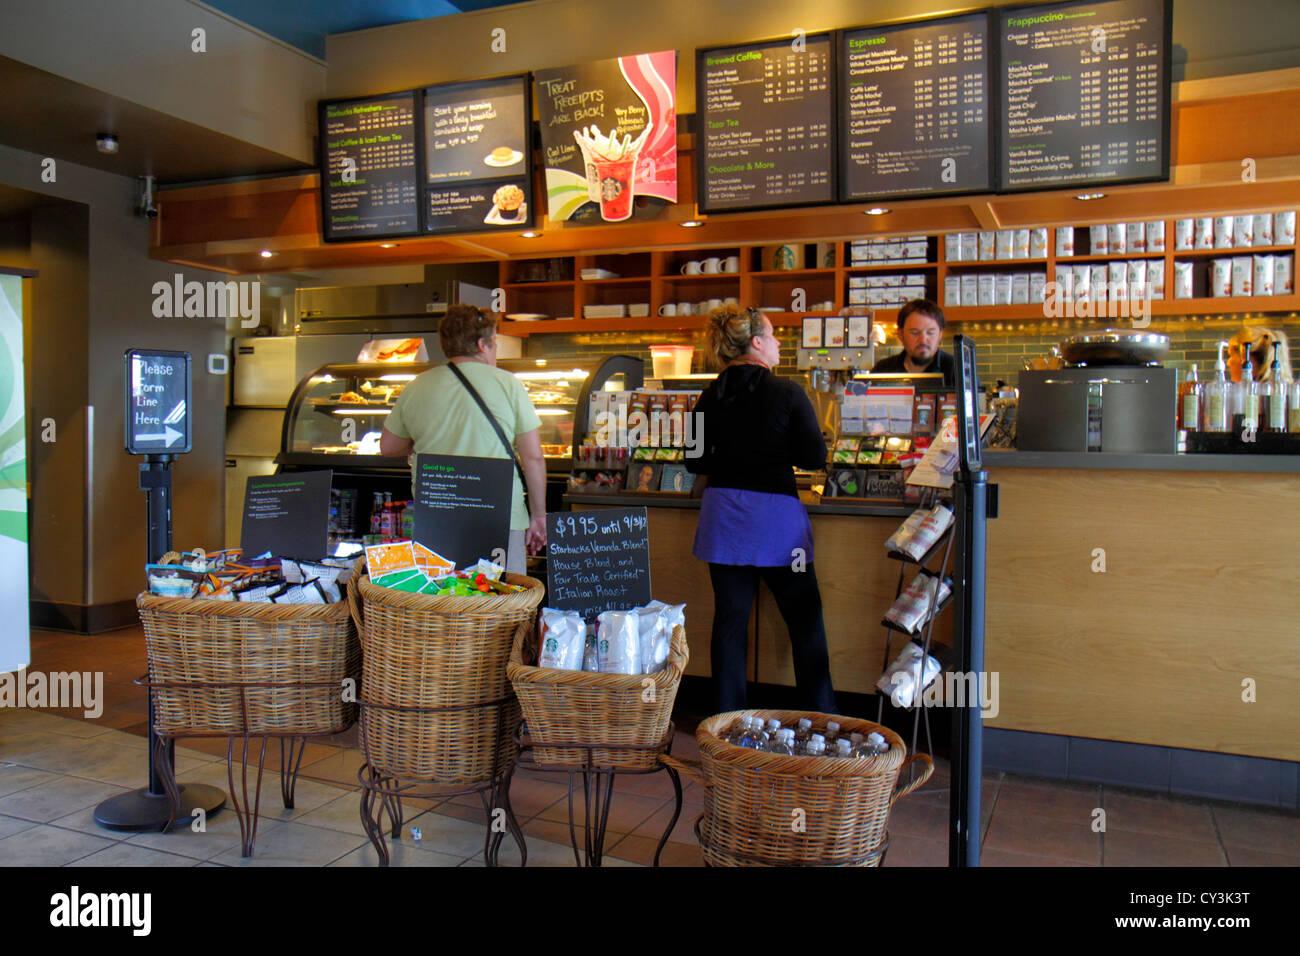 Maine Freeport Main Street Route 1 Starbucks Coffee Retail